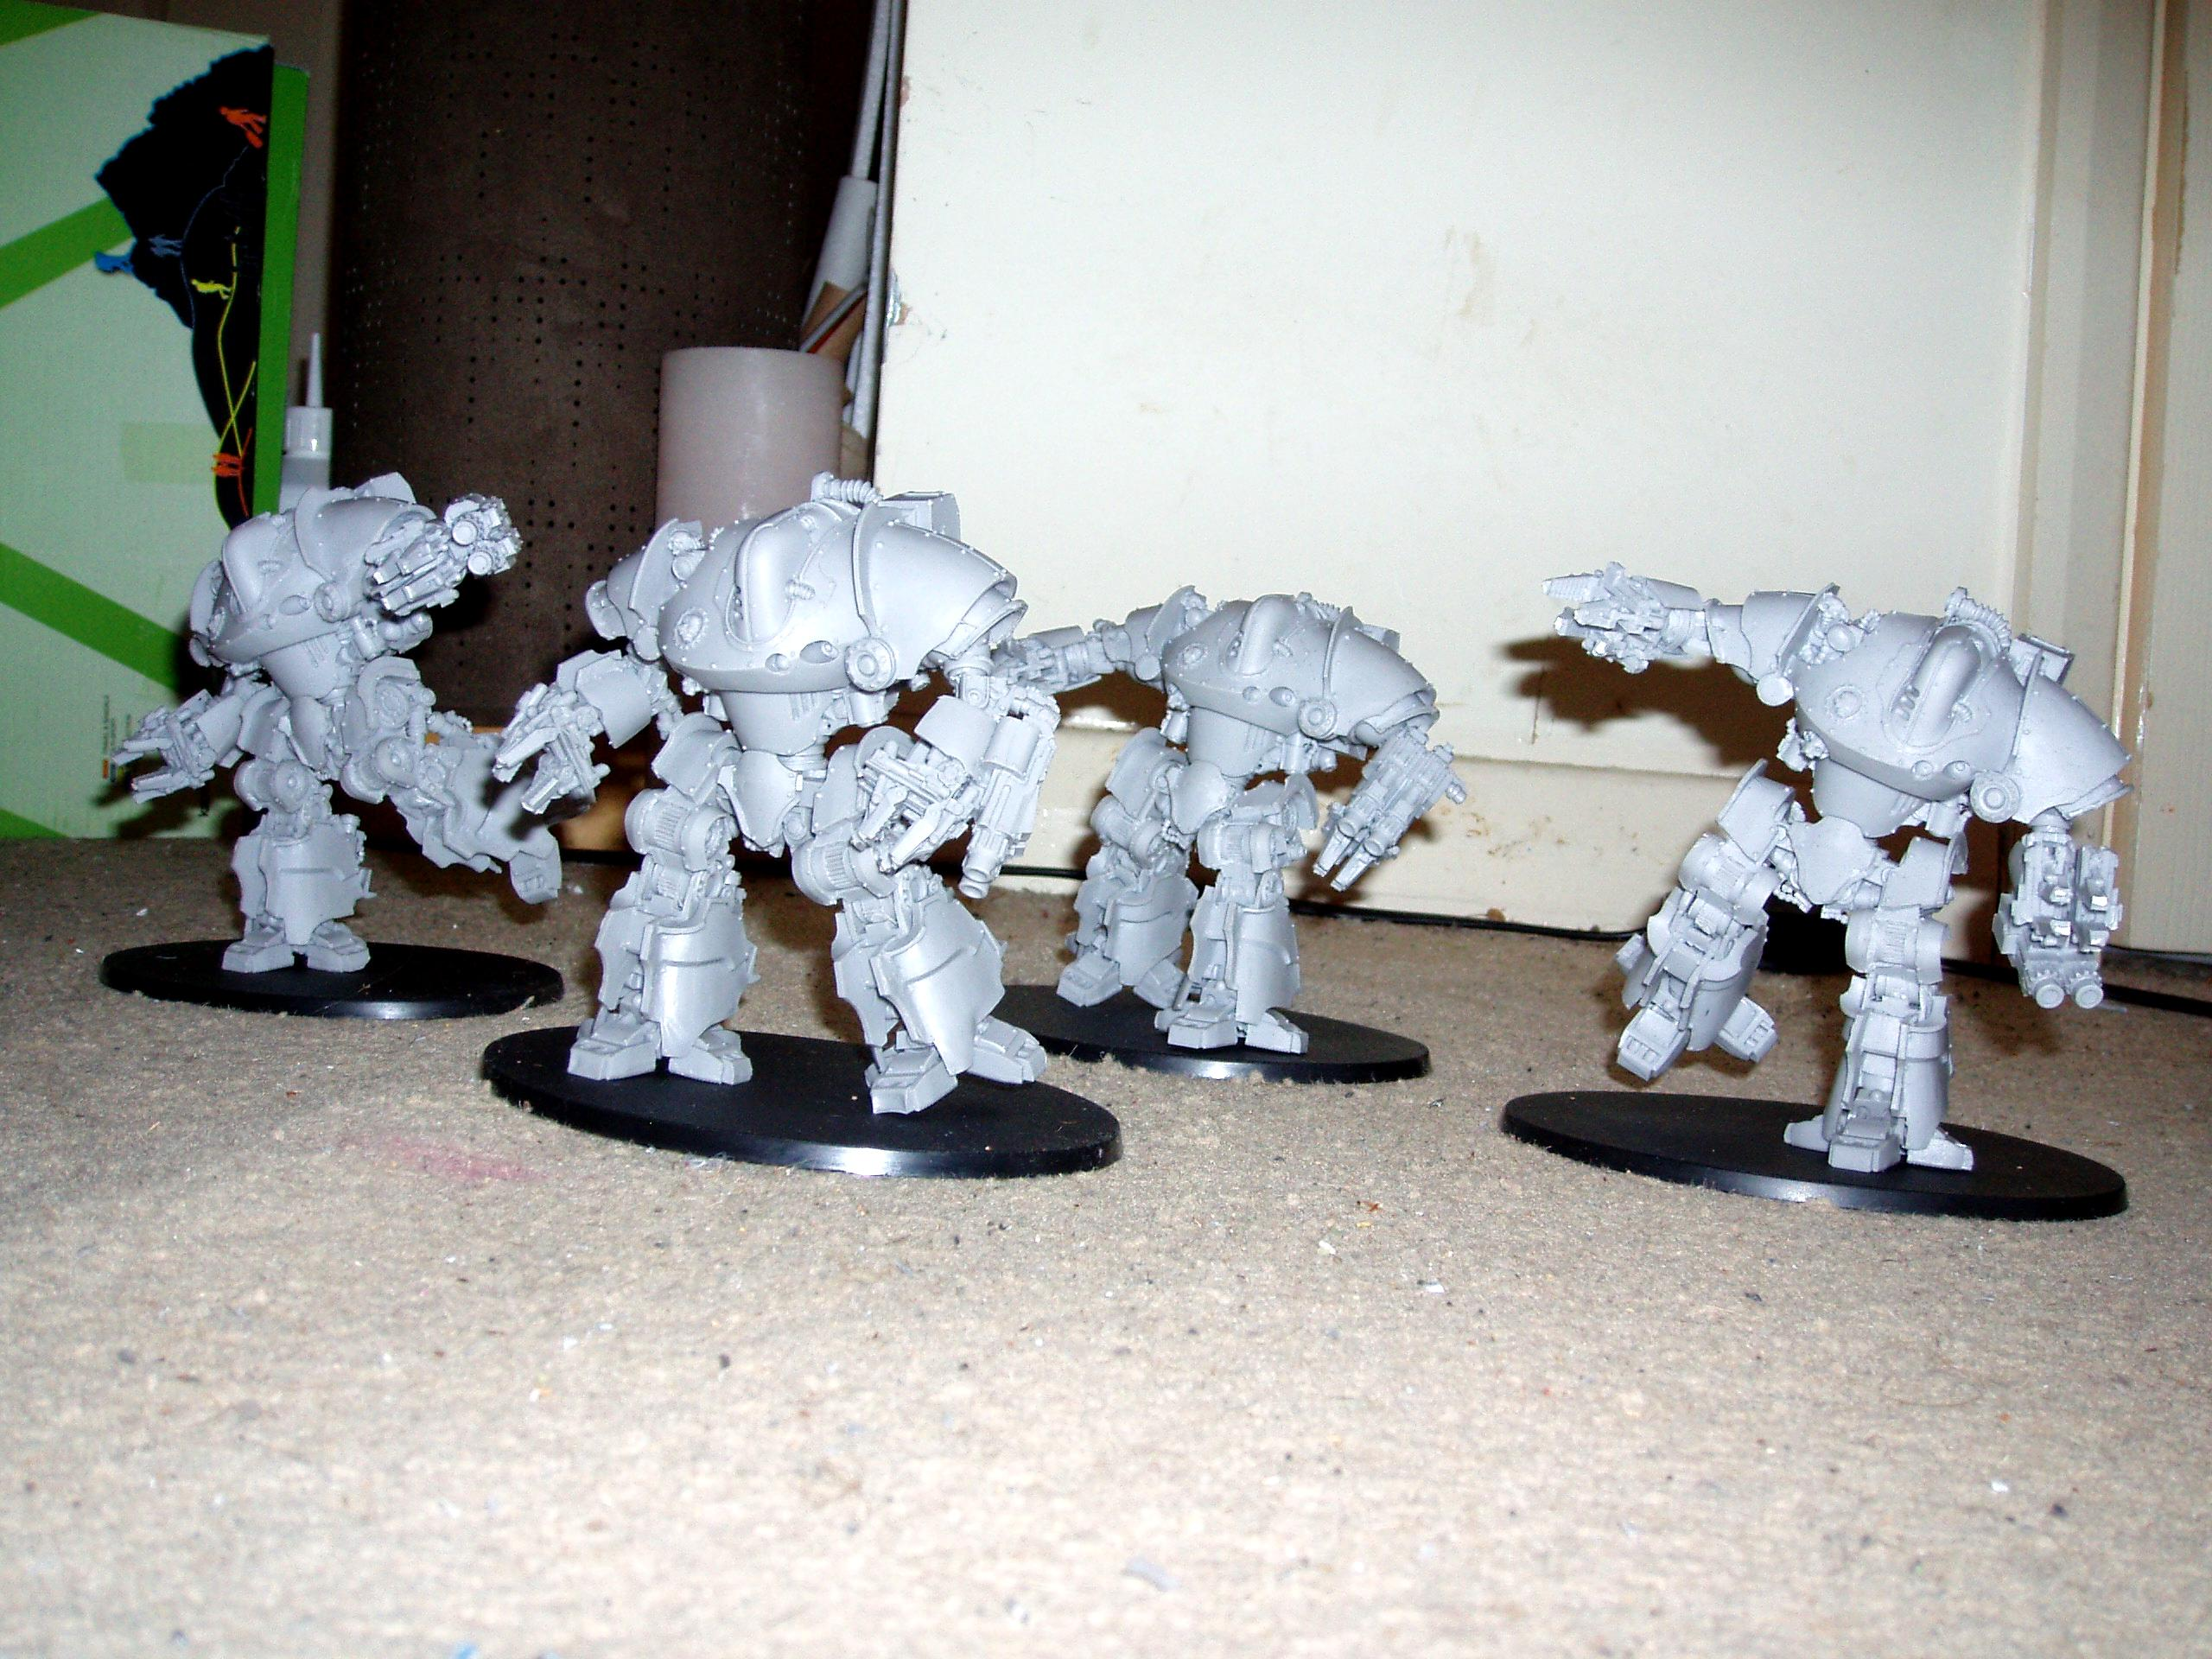 30k, Hh, Horus Heresy, Mechanicum, Monstorous Creature, Robots., Siege Automata, Taghmata Heavy Support, Thanatar, Thanatar Squad